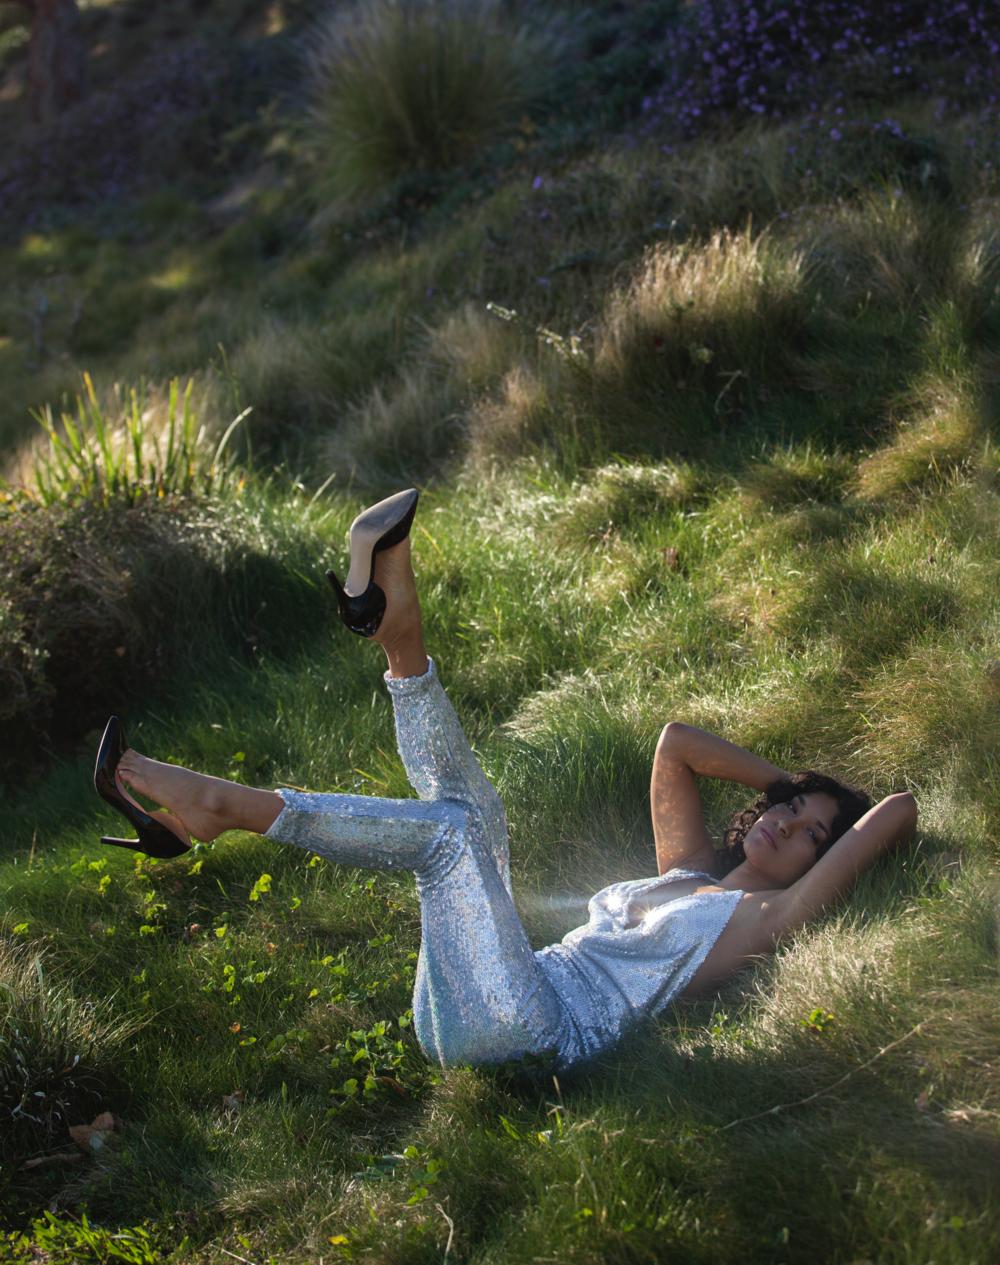 sparkle grass